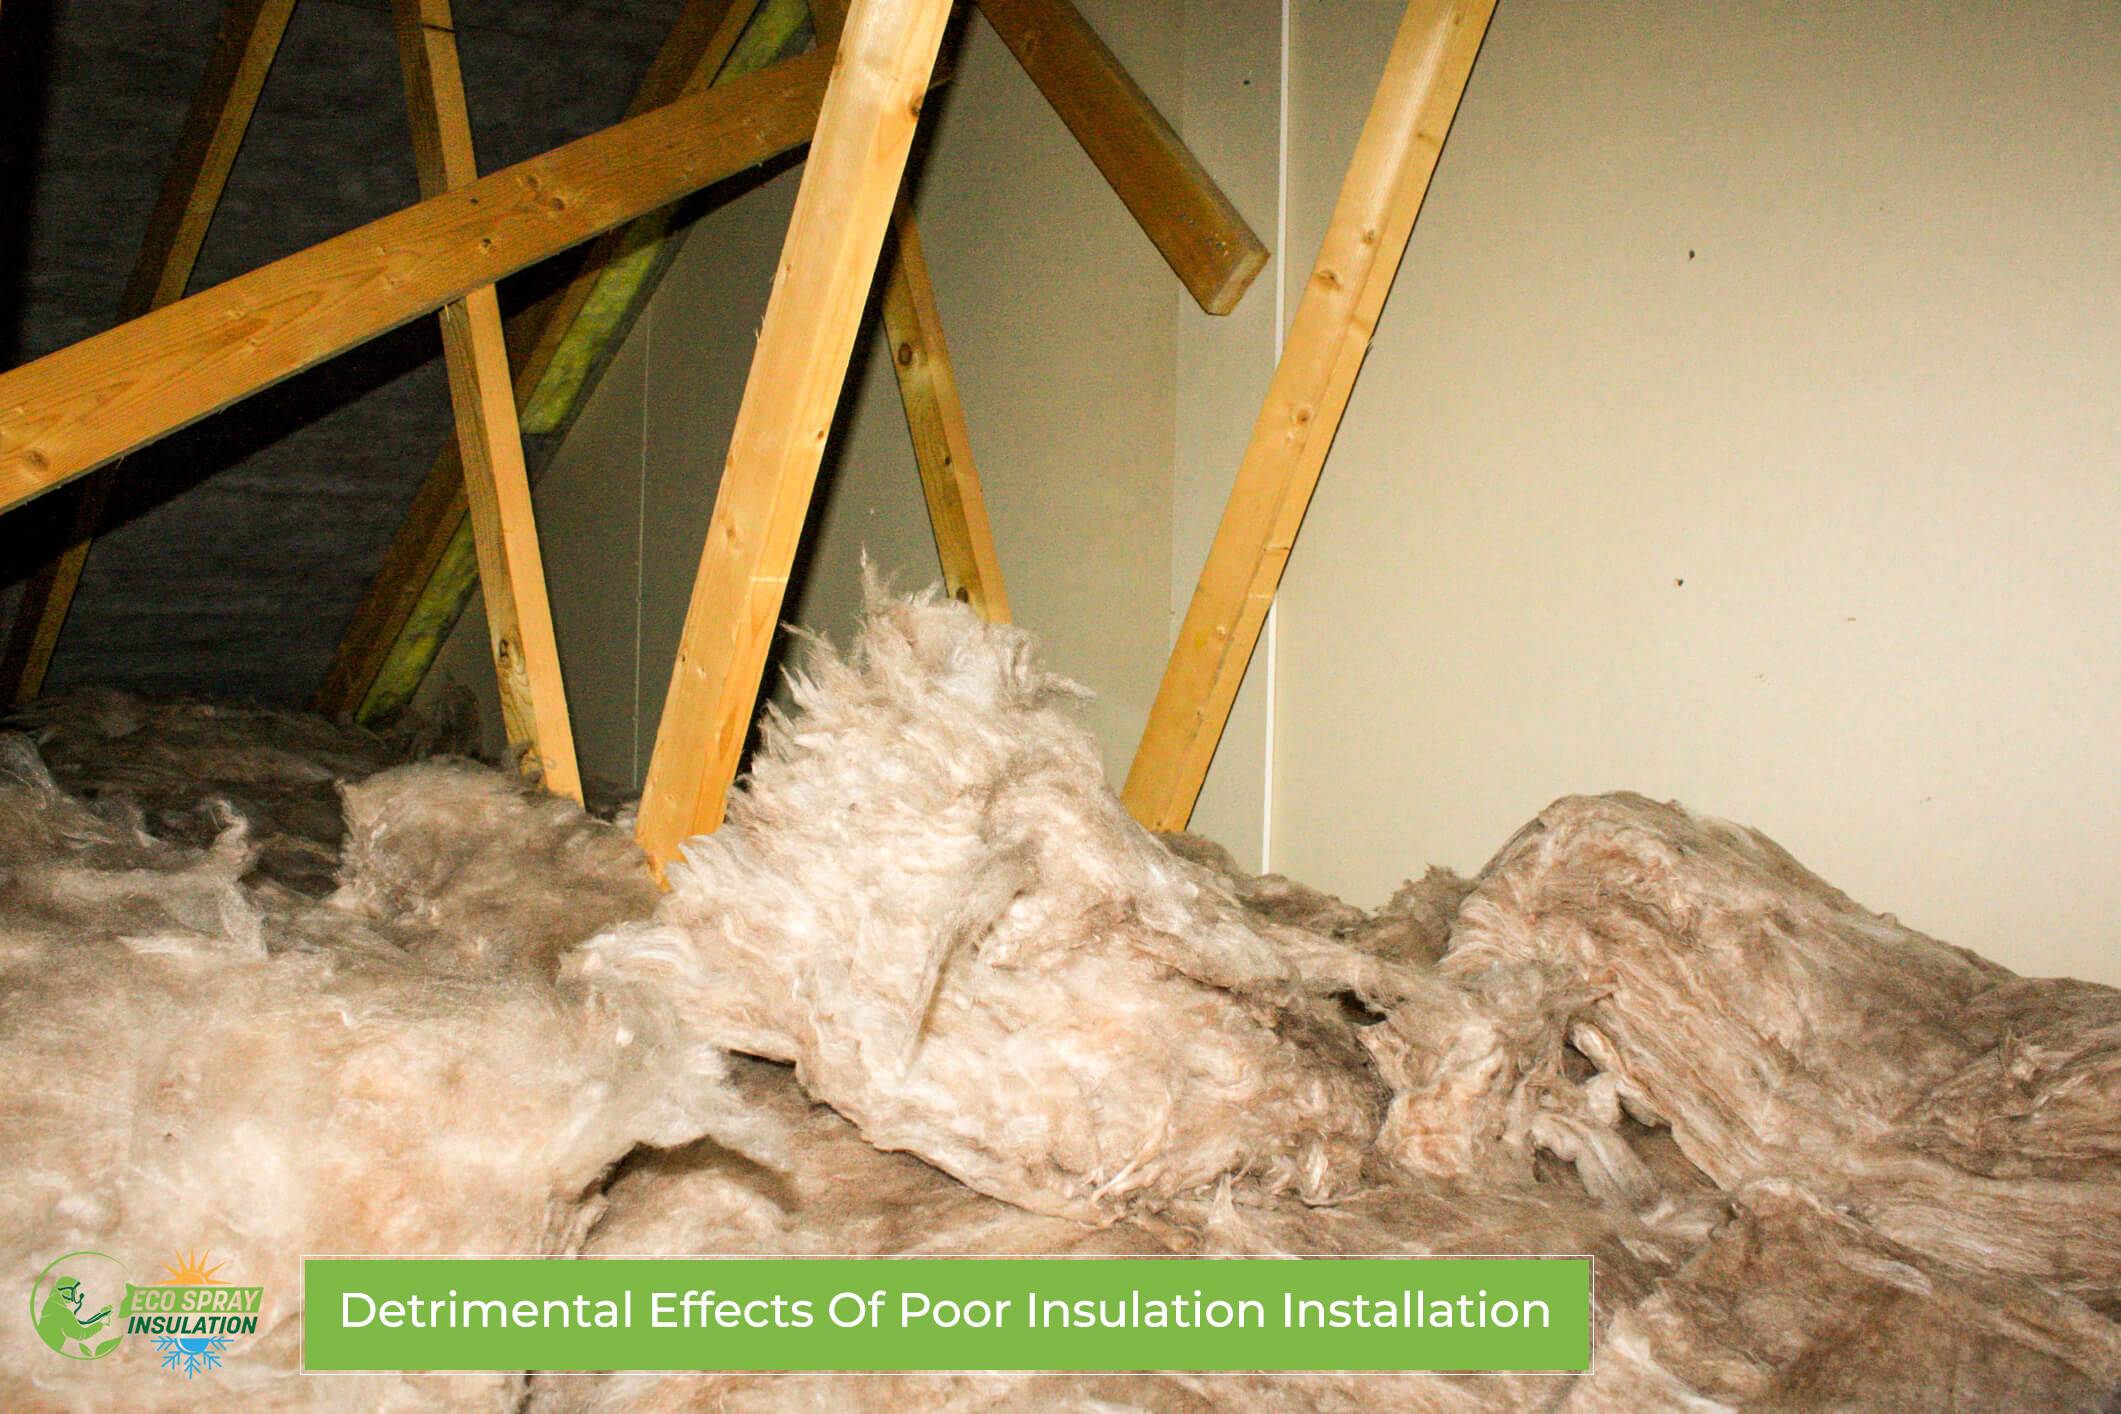 Detrimental Effects Of Poor Insulation Installation